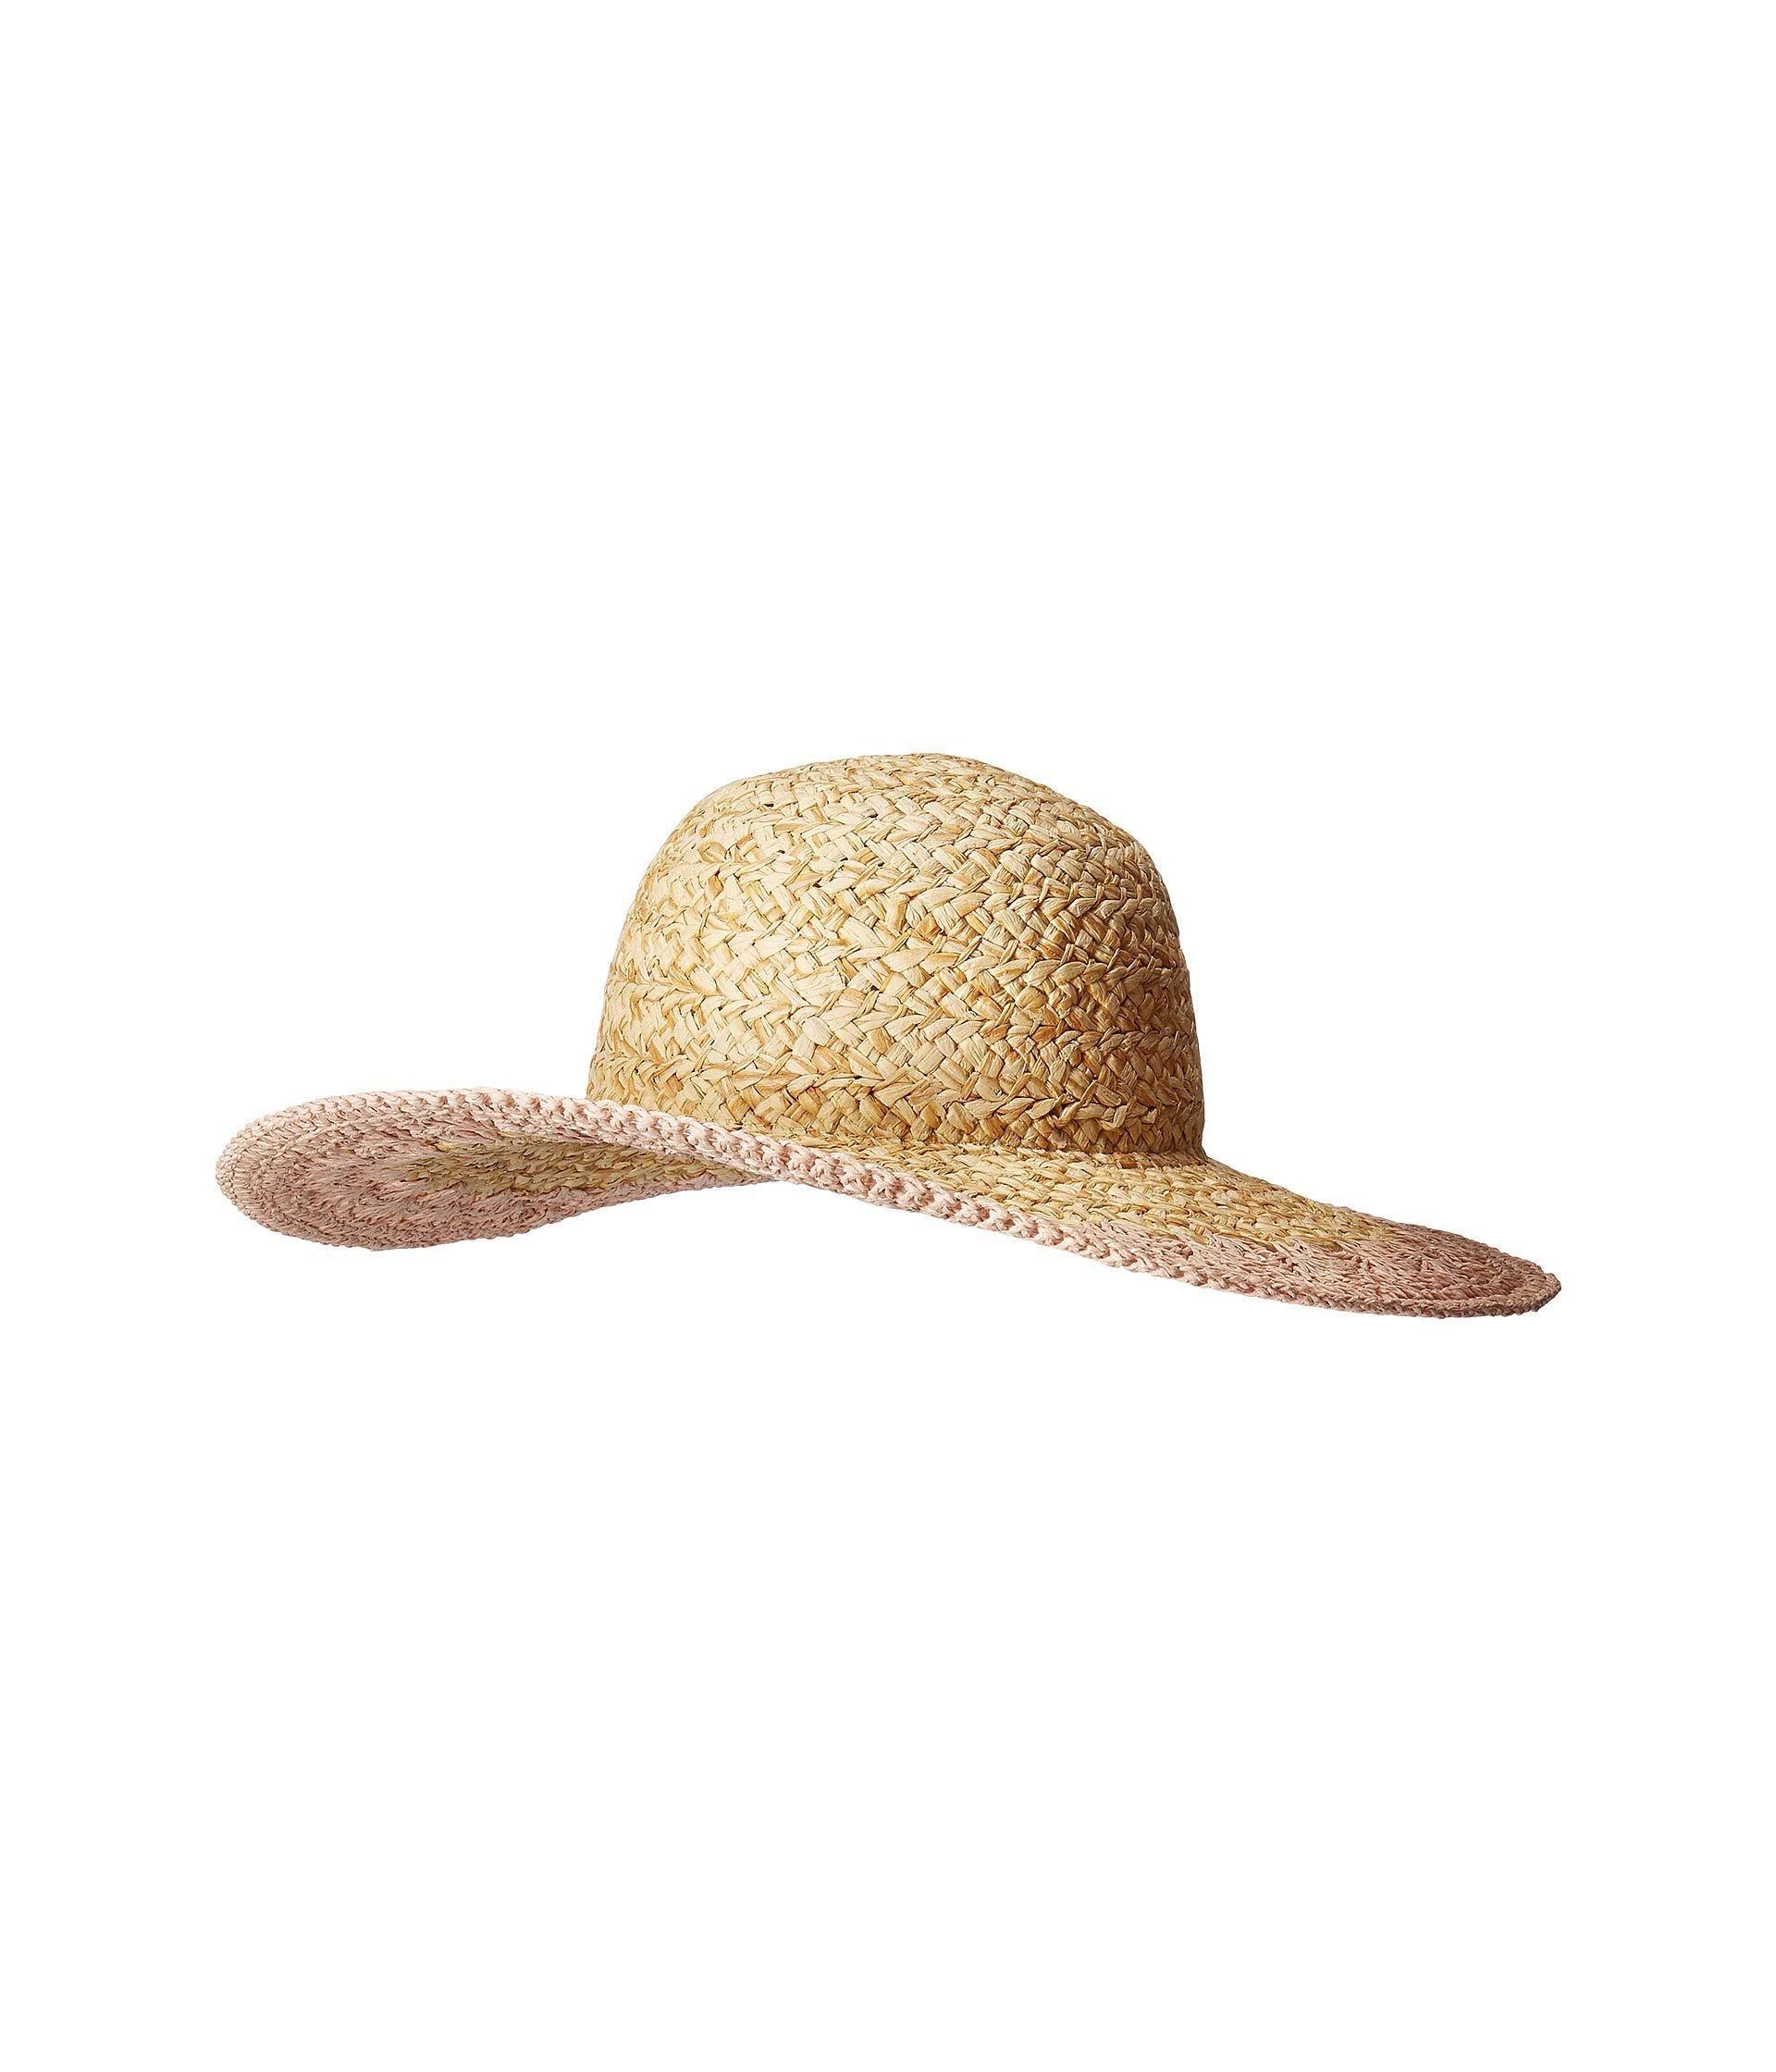 1c97fc18 Lyst - San Diego Hat Company Pbl3203 - Paper Straw Hat With Crotchet ...